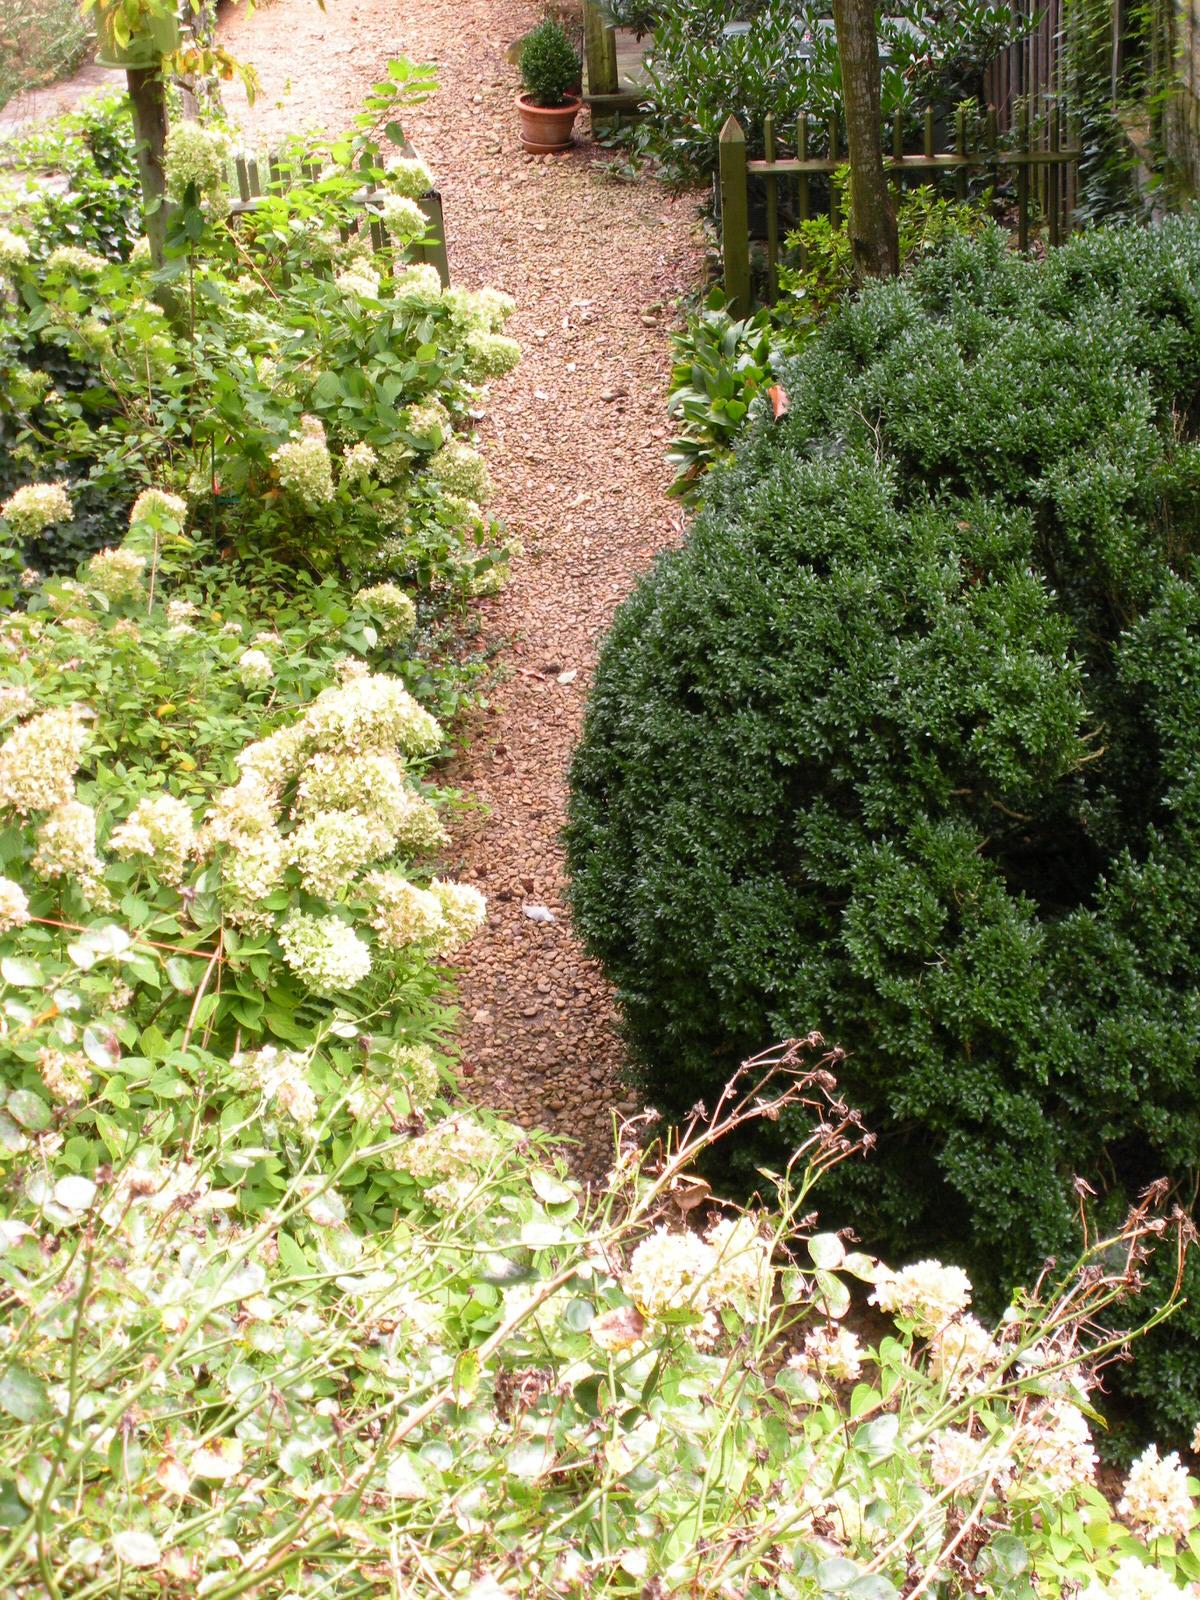 Justin Stelter Landscape Gardening - Country Garden - Justin Stelter Landscape Gardening - Country Garden2887095824_6012c889e2_o.jpg